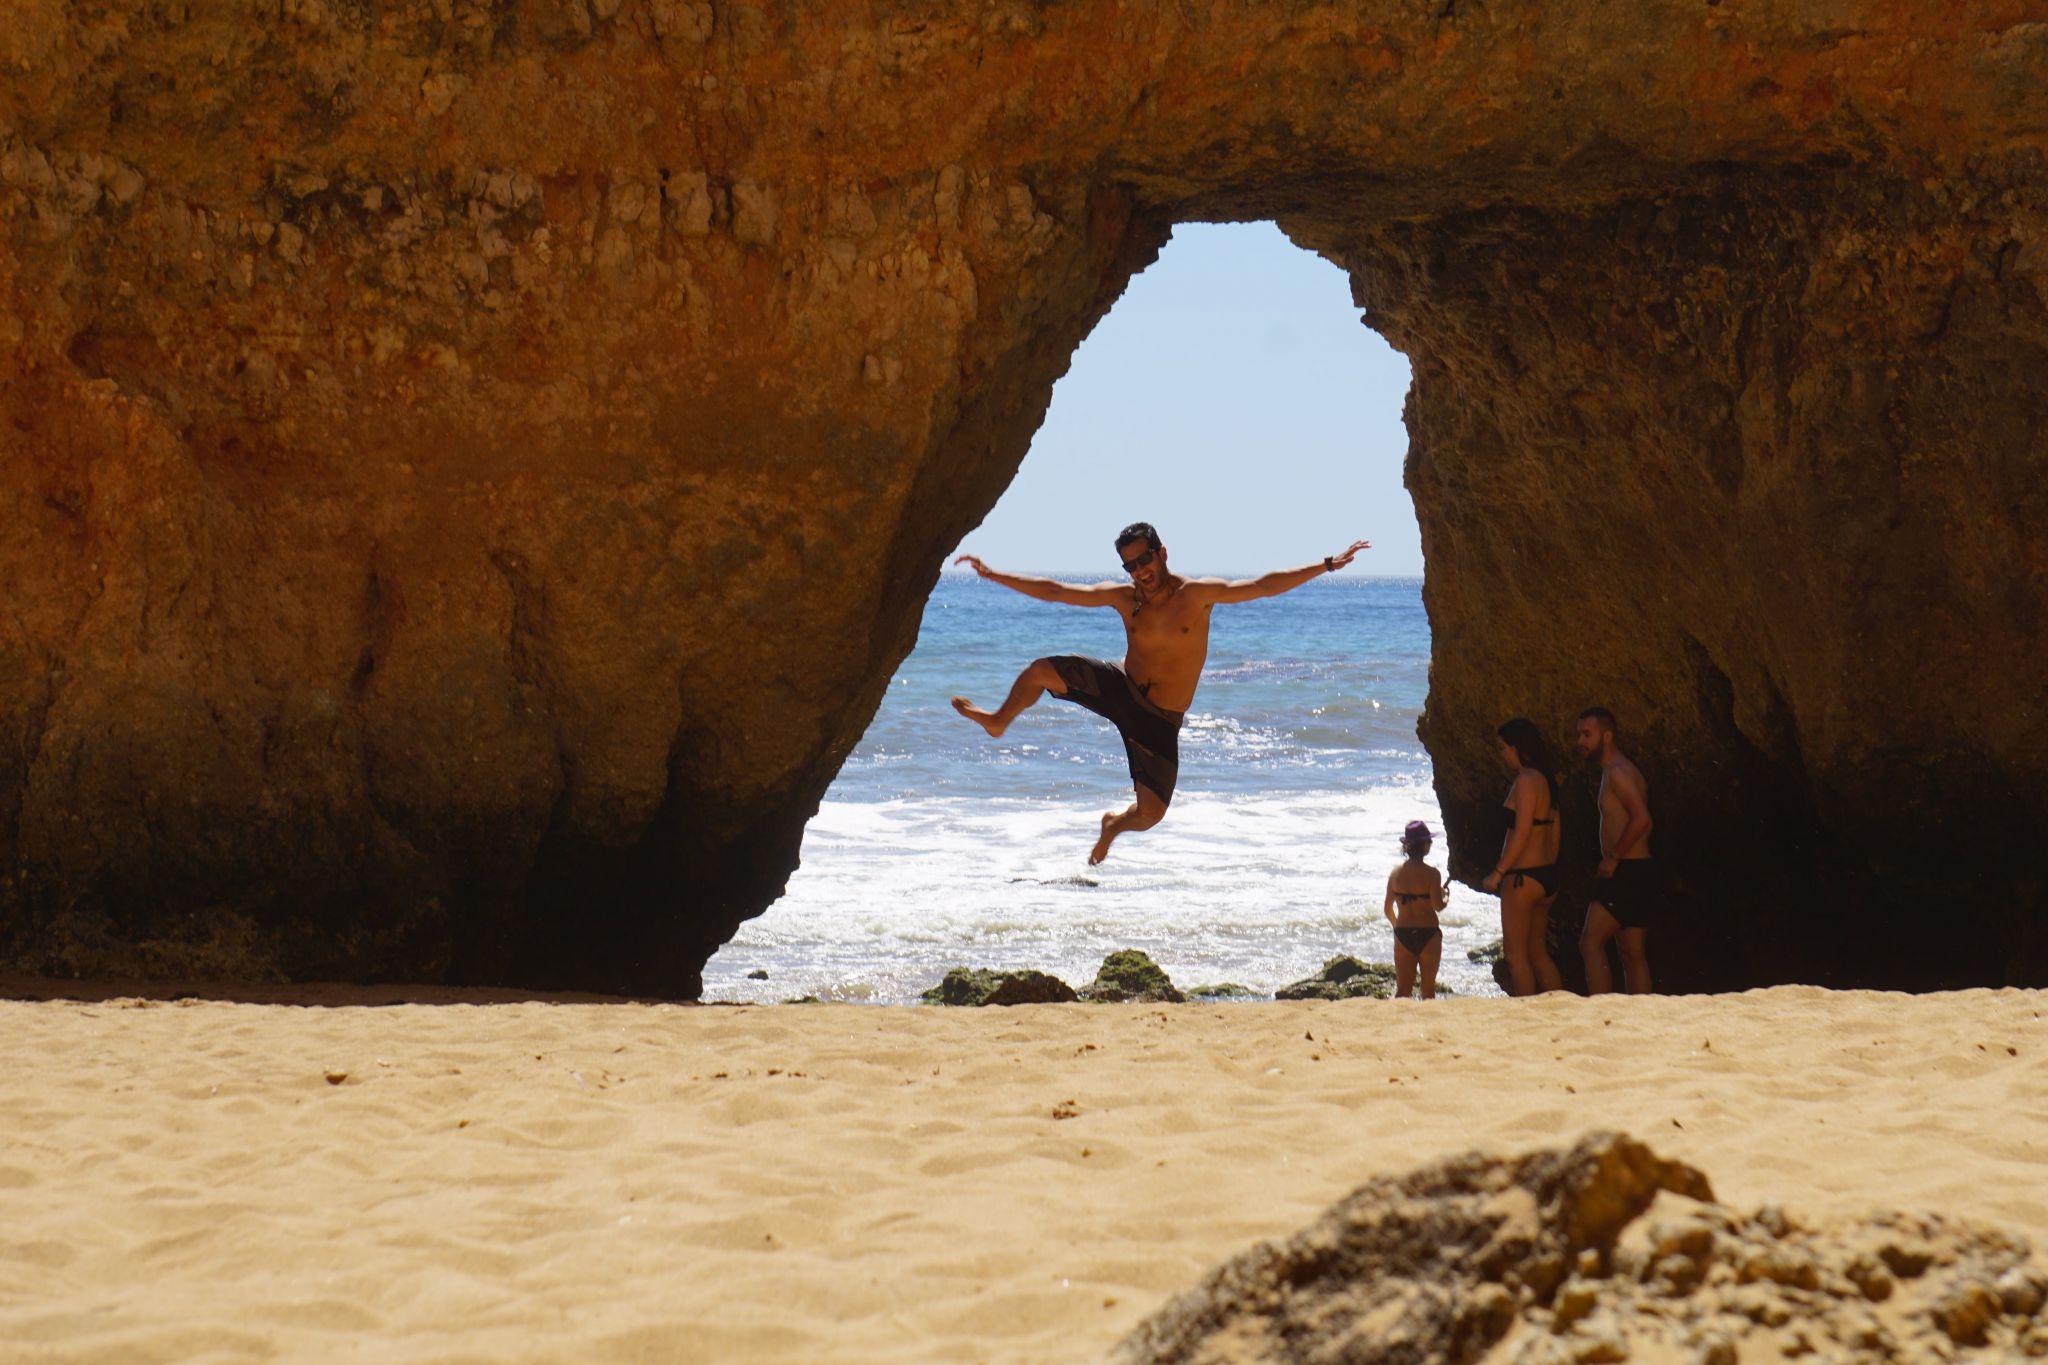 Lagos beaches, Portugal